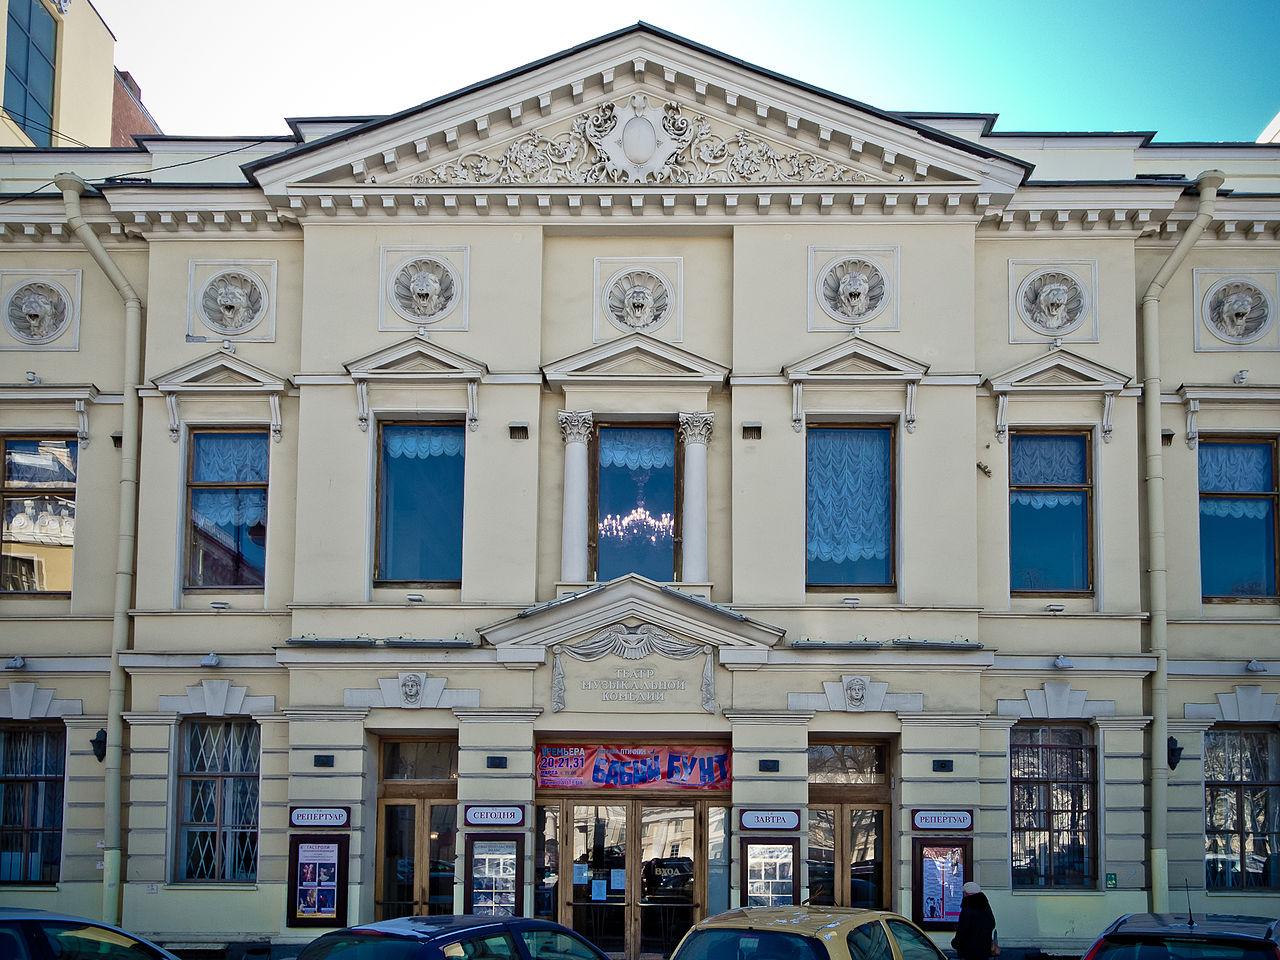 Театр Музыкальной Комедии. Фото: Florstein (Wikimedia Commons)